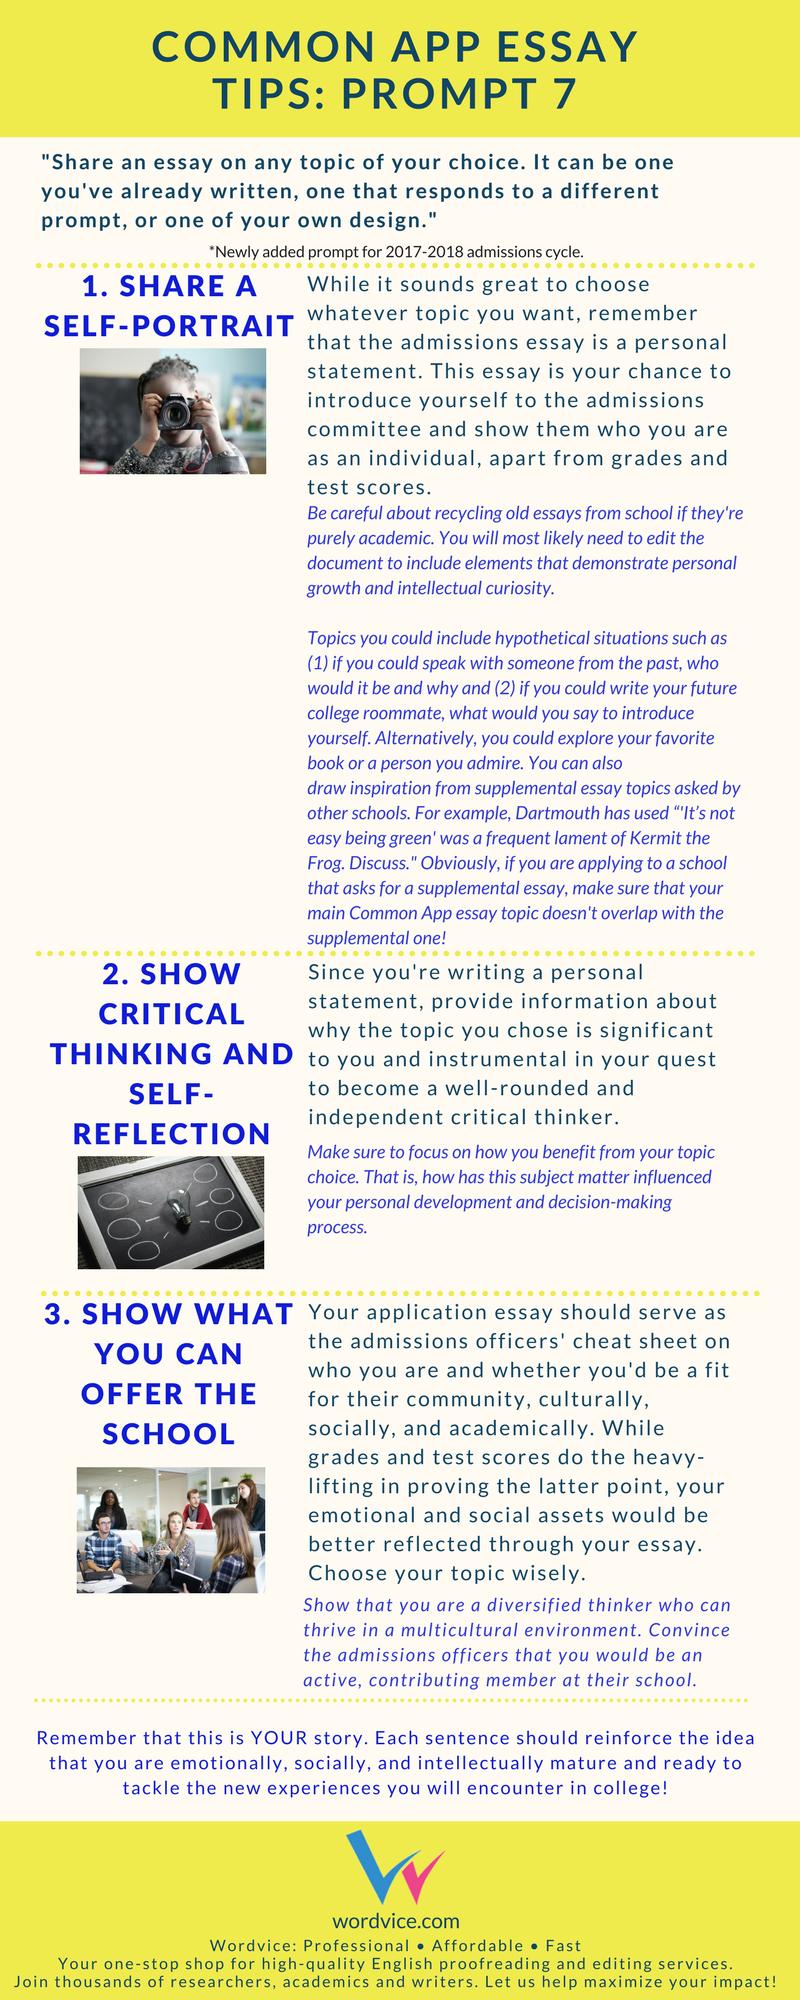 021 Essay Example Common App Brainstormprompt College Topics Frightening 2017 Boston Prompts Harvard Ideas Full